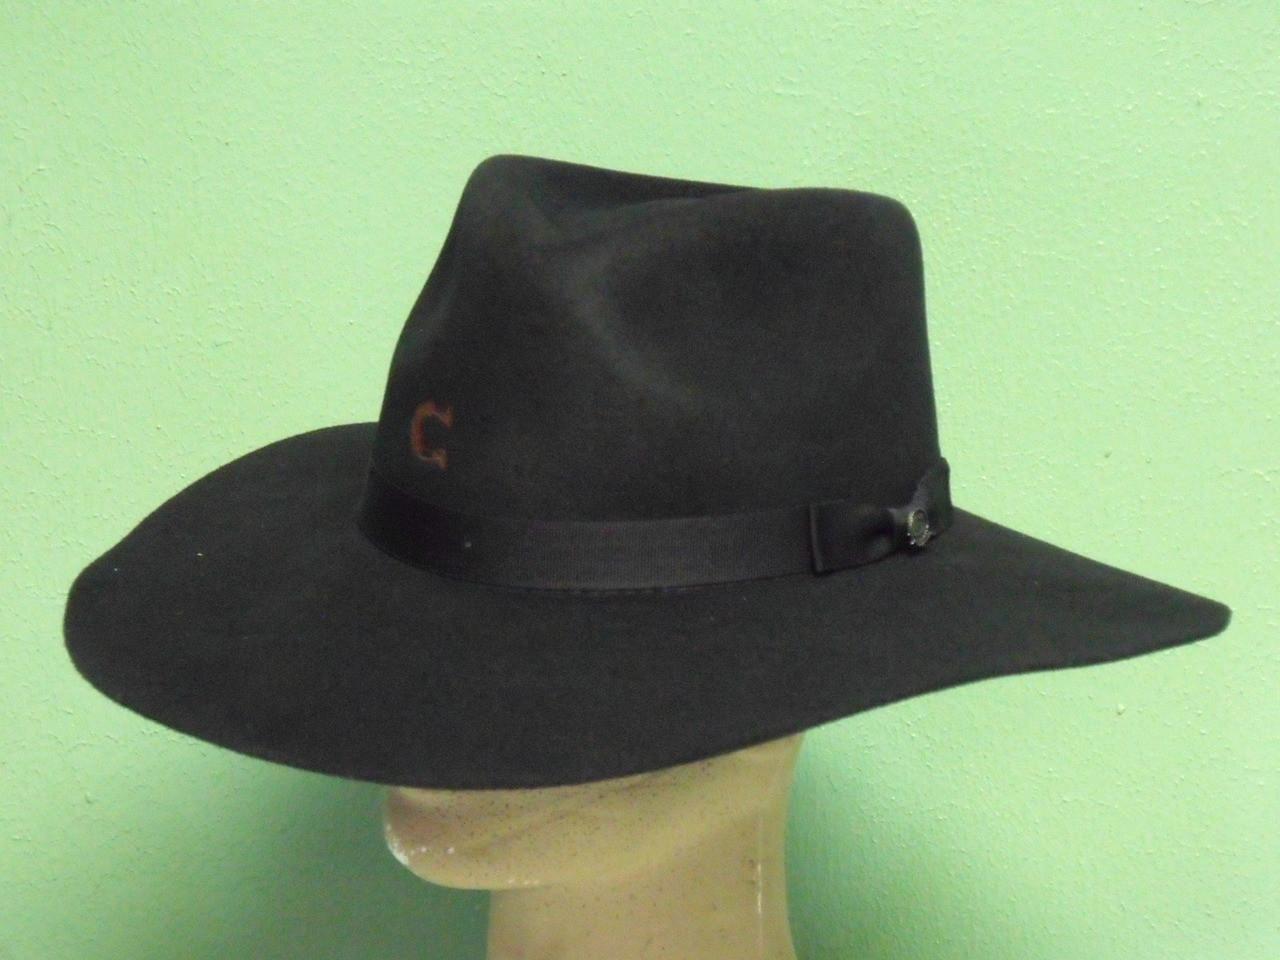 Charlie 1 Horse Highway Western Fedora Hat - One 2 mini Ranch 05eaee0ef5e9